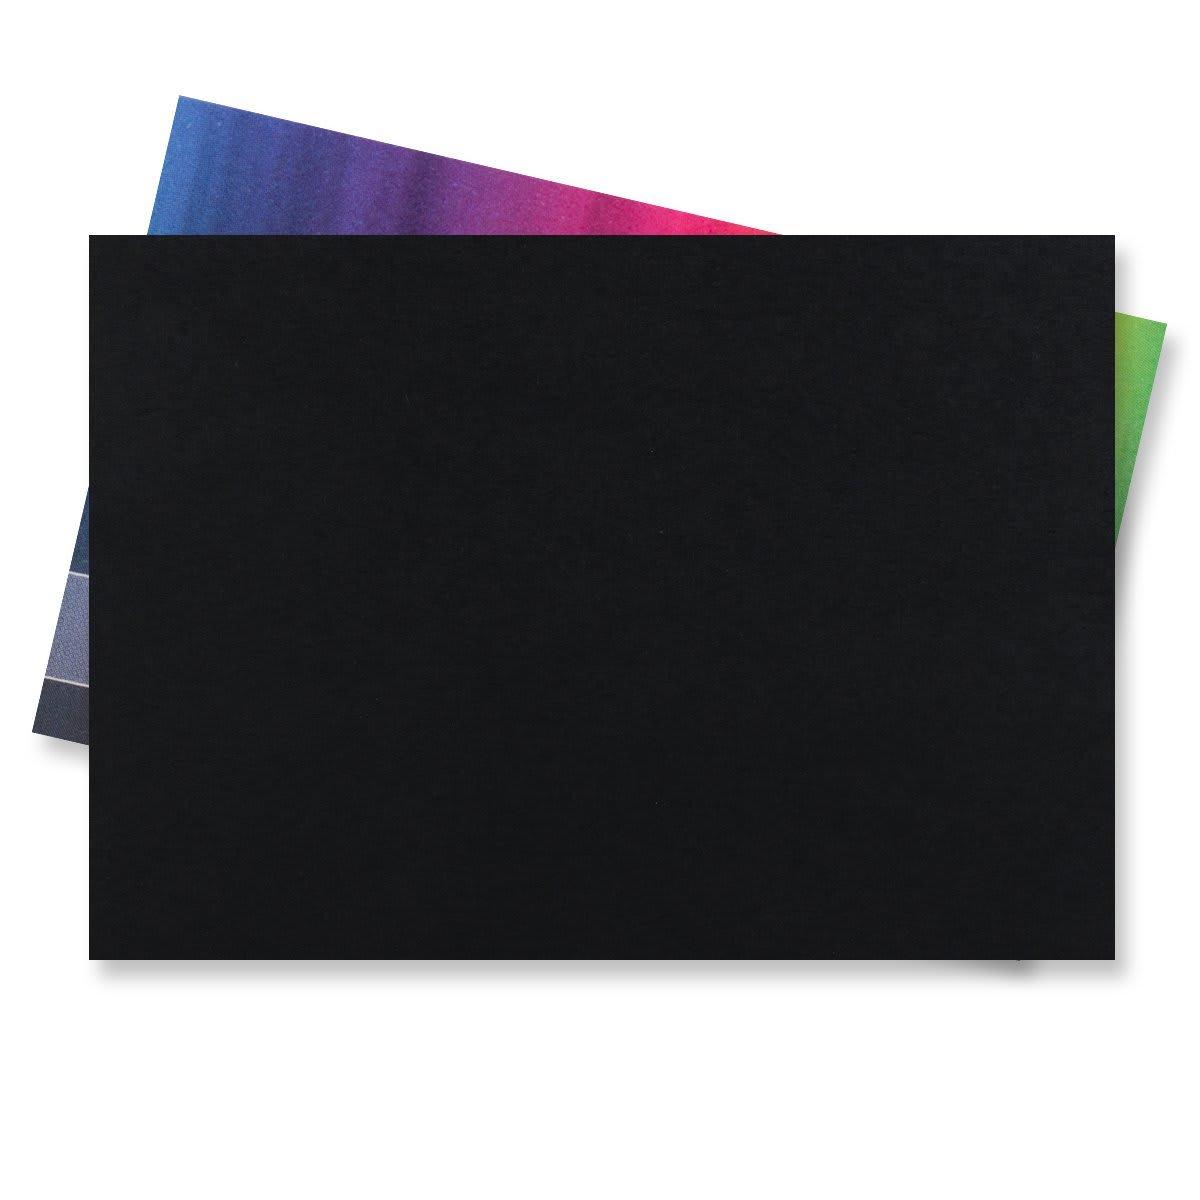 62 x 94MM BLACK V-FLAP PEEL AND SEAL ENVELOPES